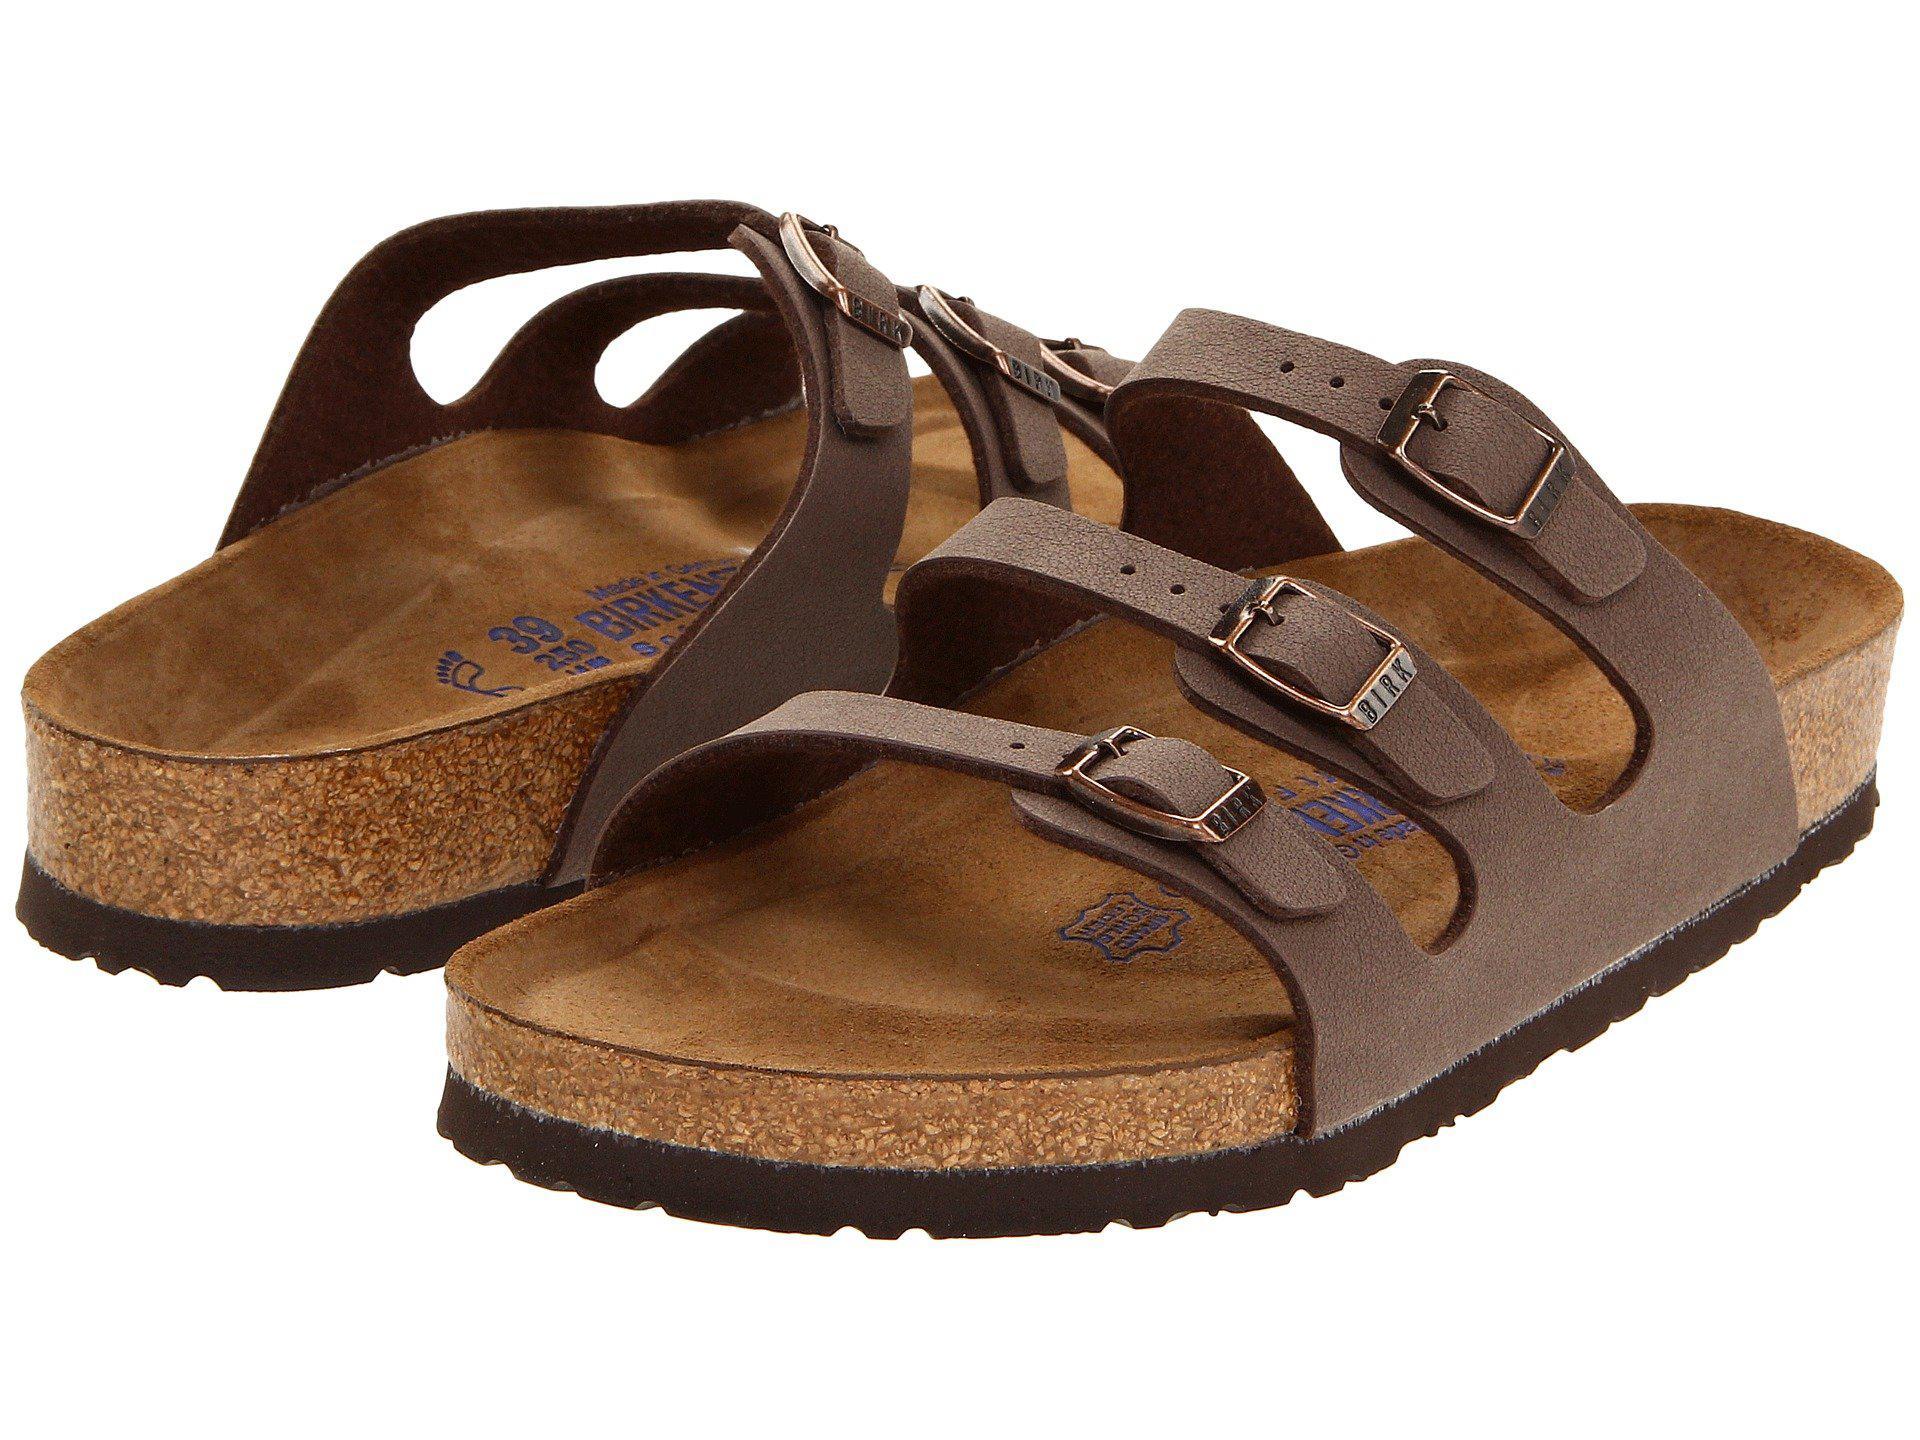 e4c937527eea Birkenstock. Brown Florida Soft Footbed - Birkibuc (mocha Birkibuc) Women s  Sandals